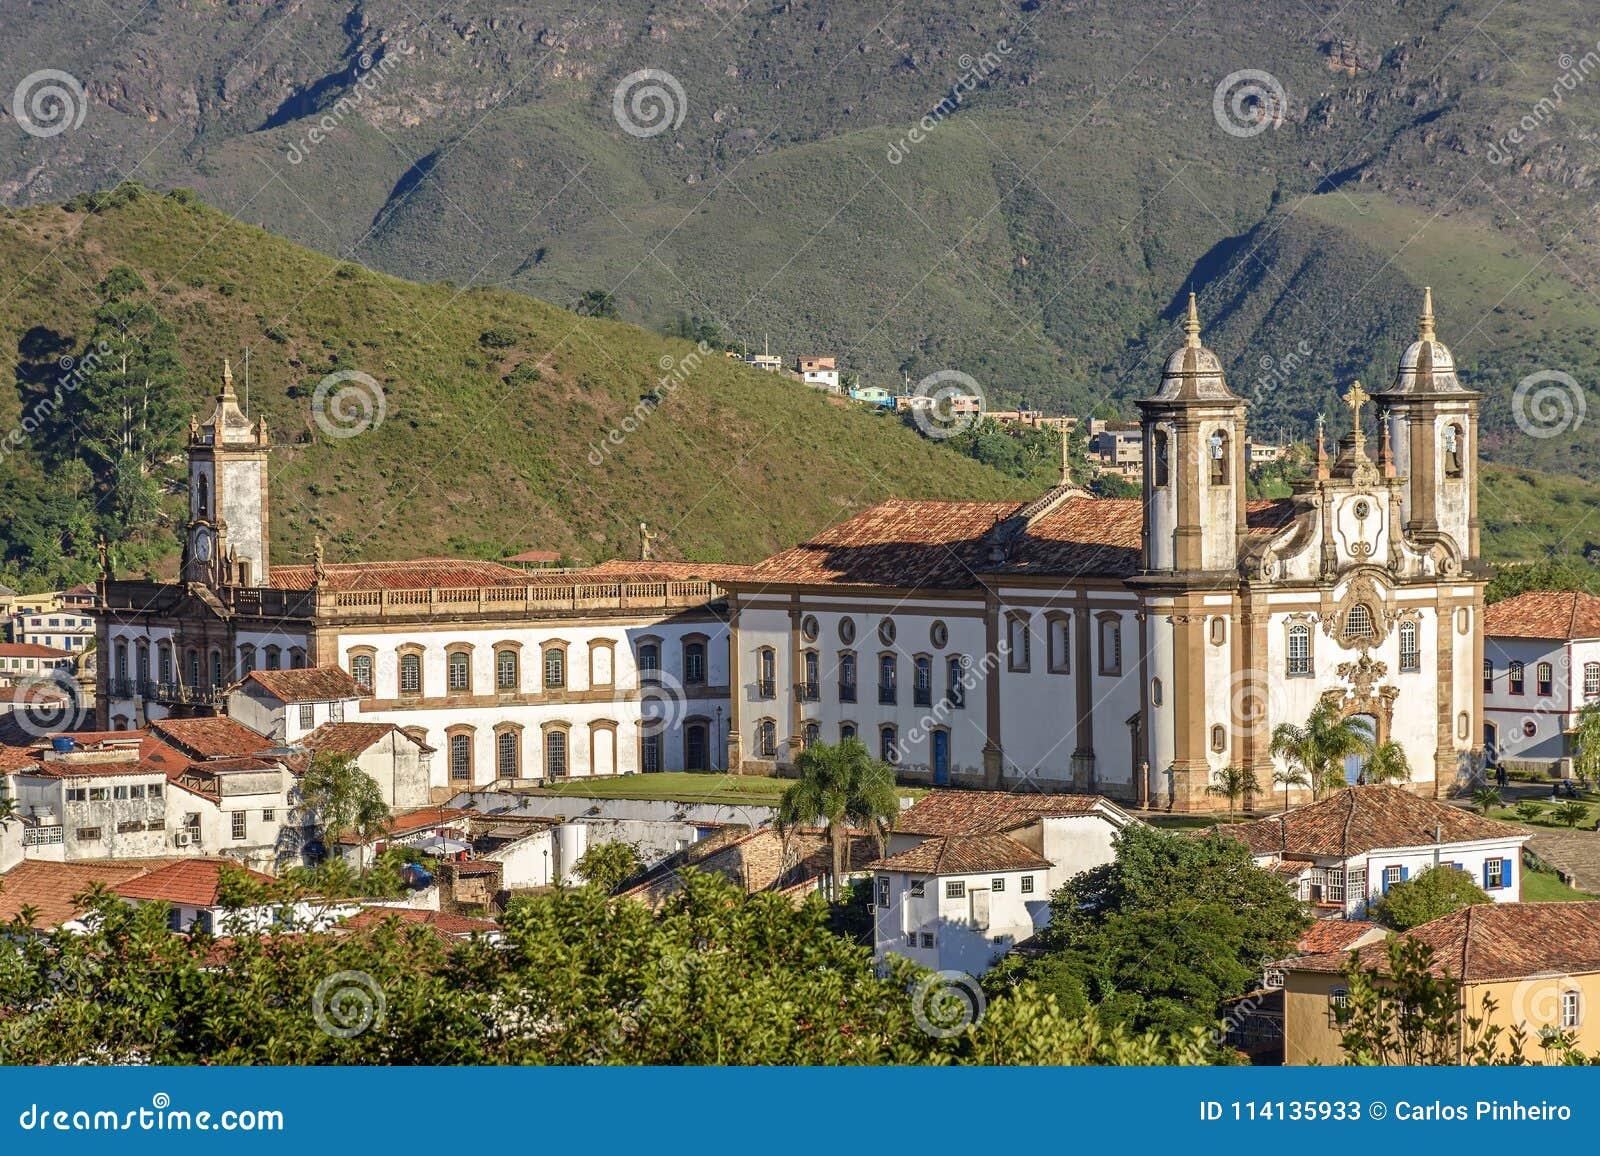 Odgórny widok centrum historyczny Ouro Preto miasto w minas gerais, Brazylia